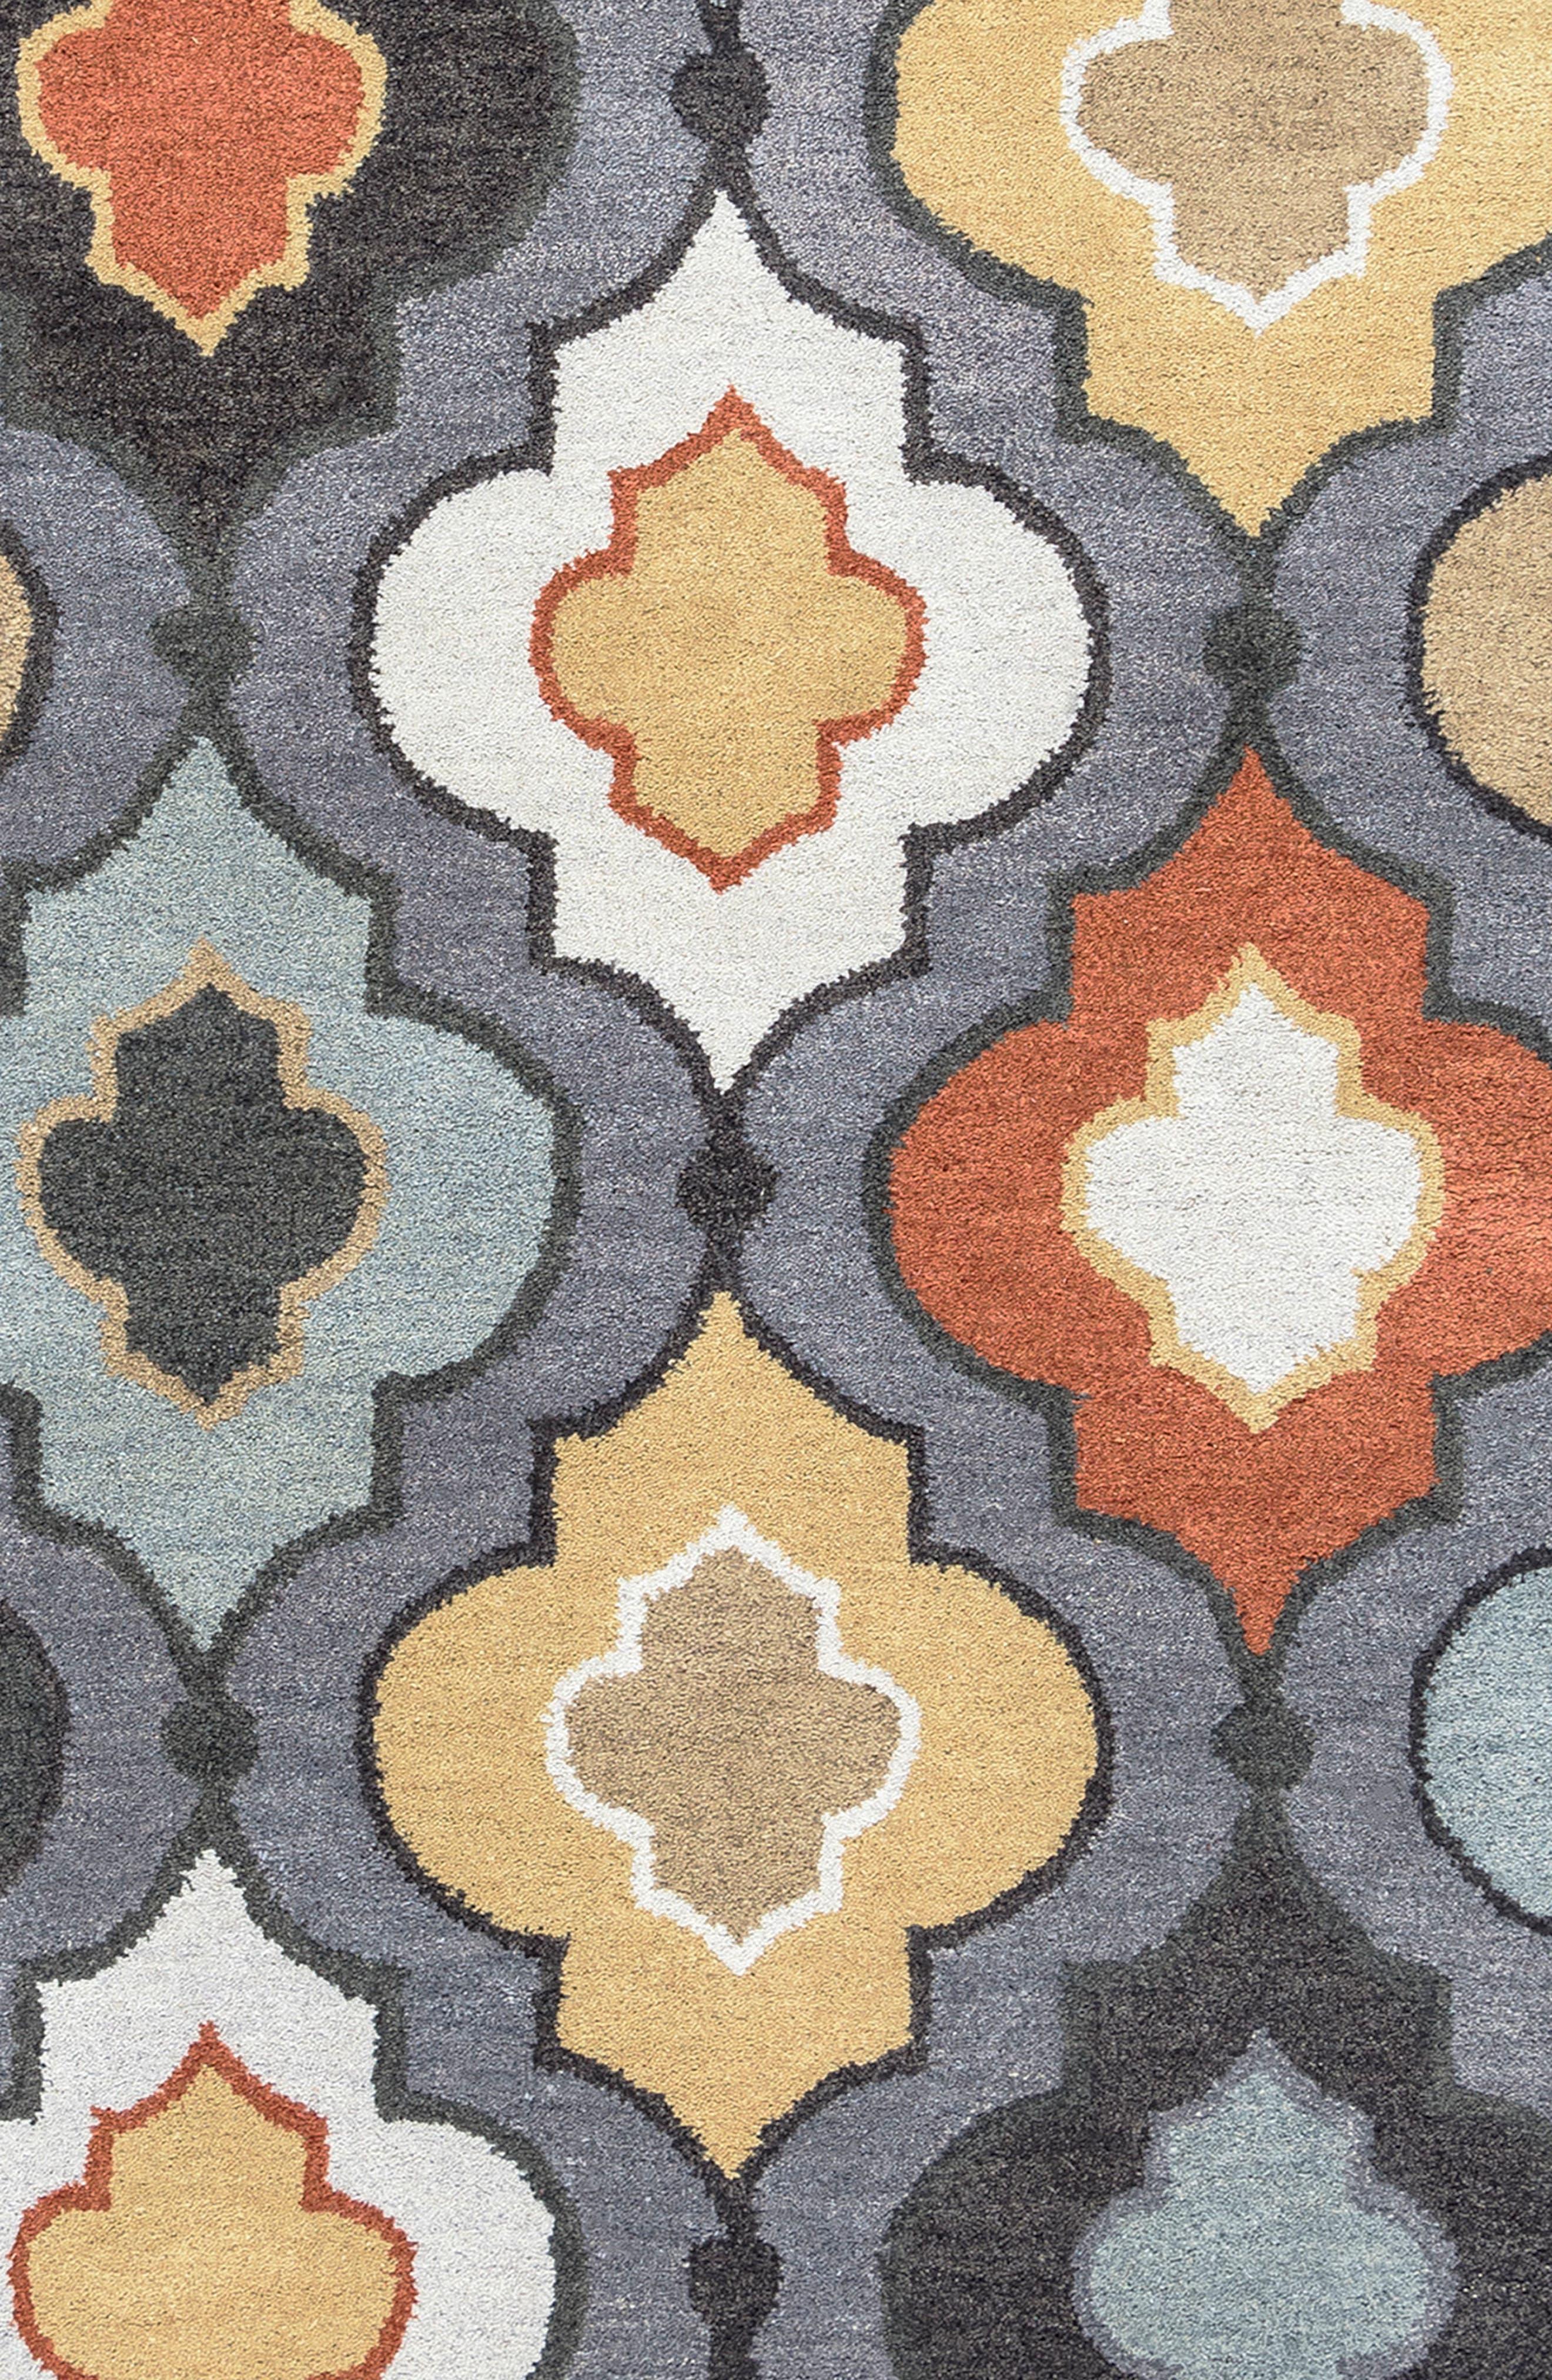 'Quatrefoil' Hand Tufted Wool Area Rug,                             Alternate thumbnail 3, color,                             030